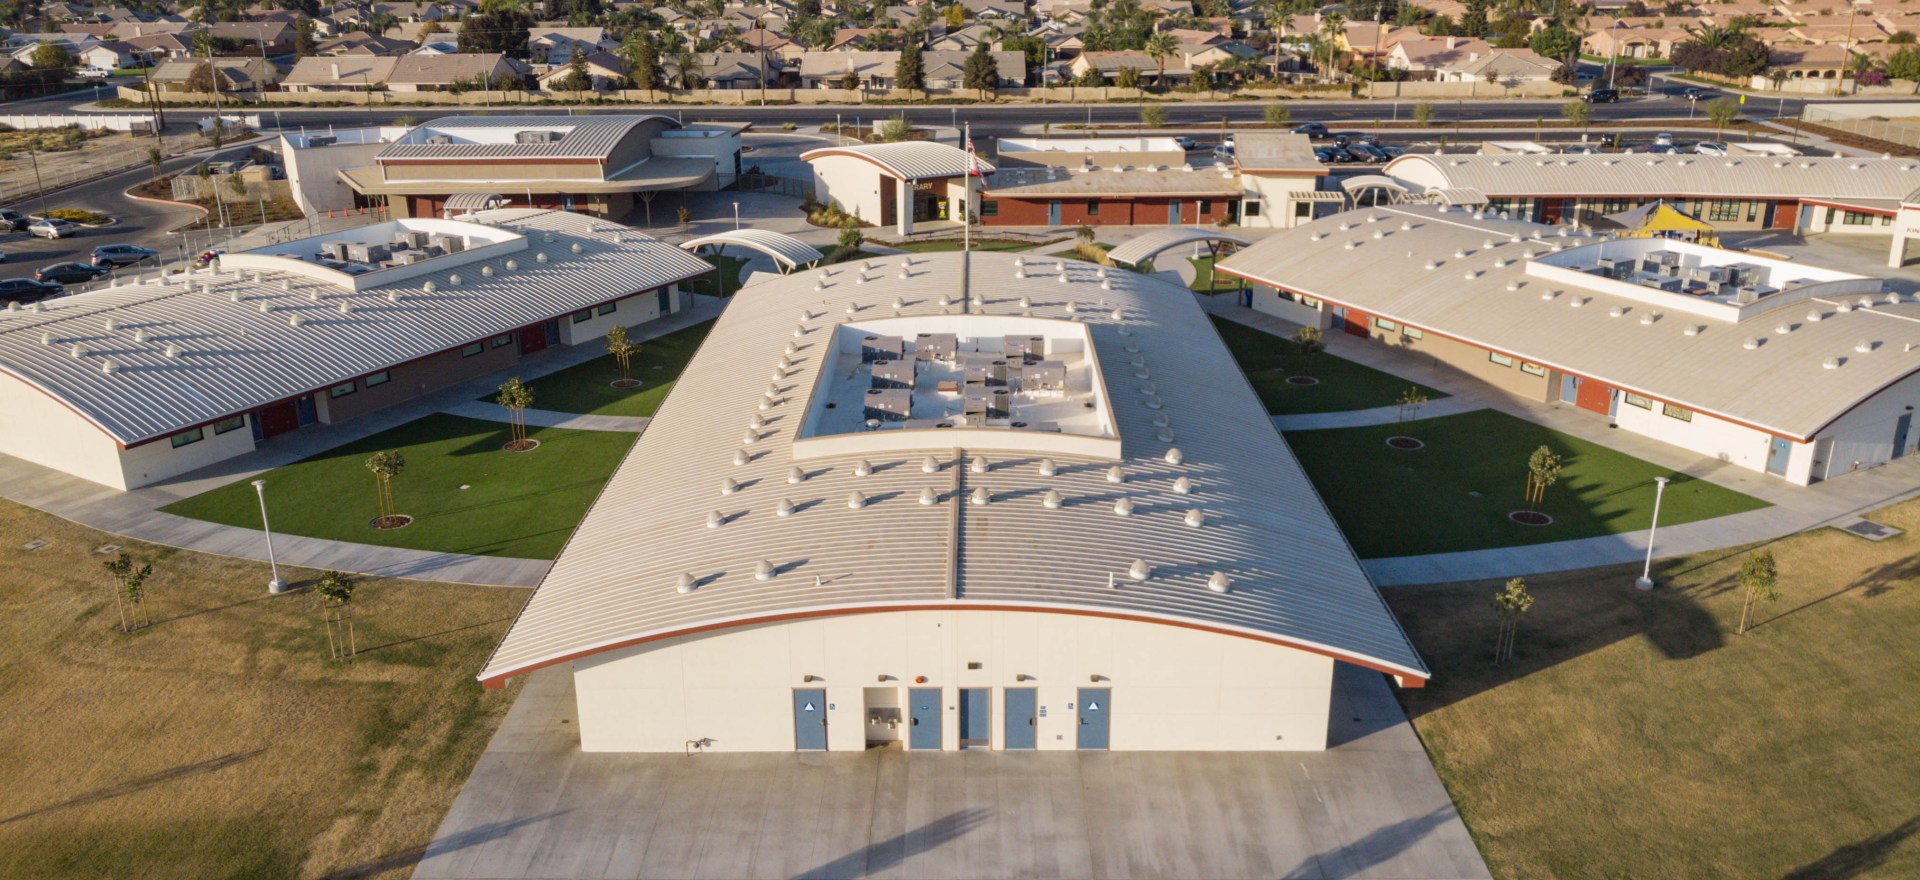 JTSModular-WhitleyElementarySchool-RobRijnenPhotography (34 of 36)